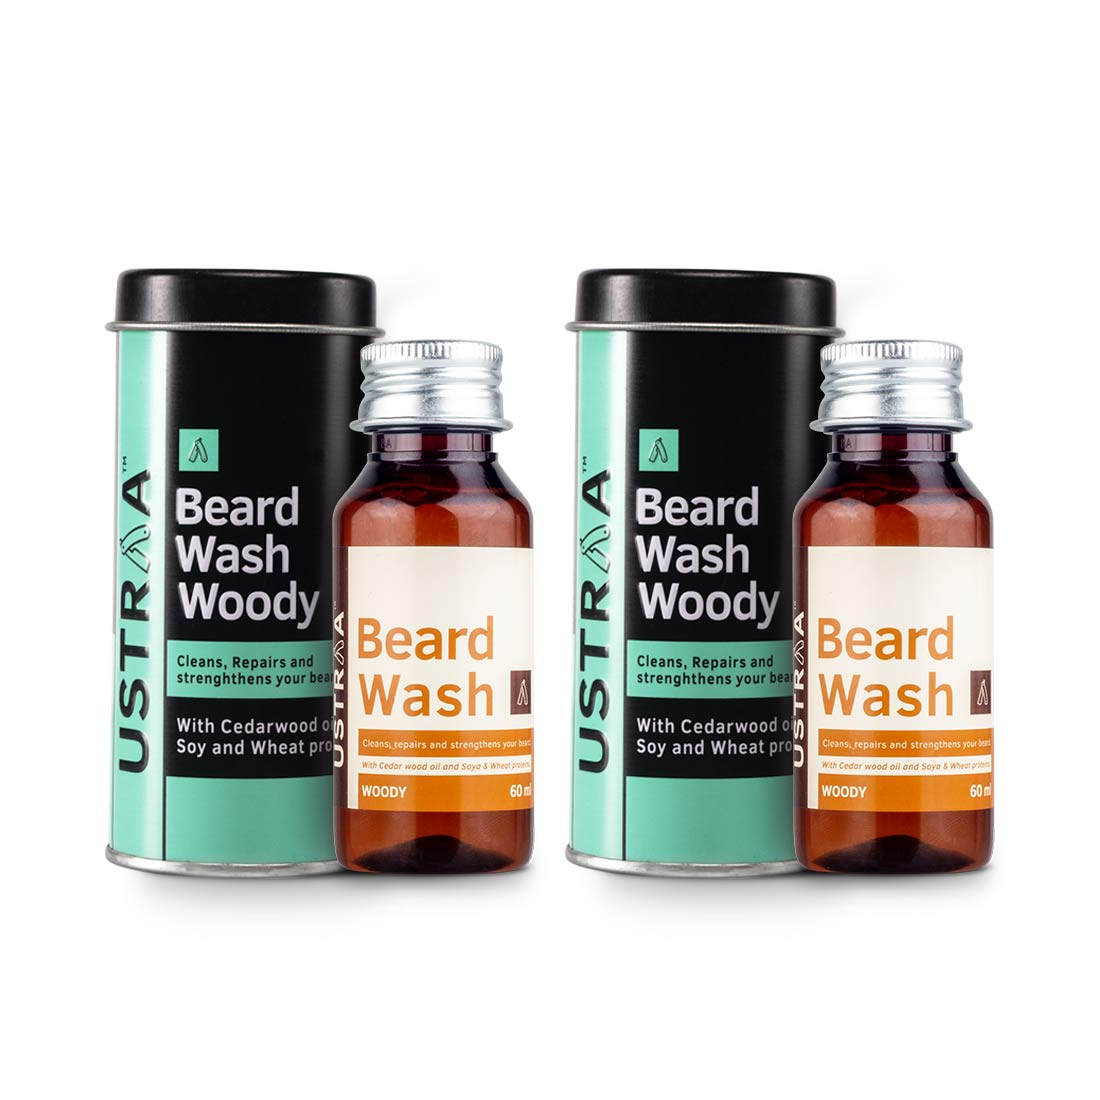 Beard Wash (Woody) - Set of 2